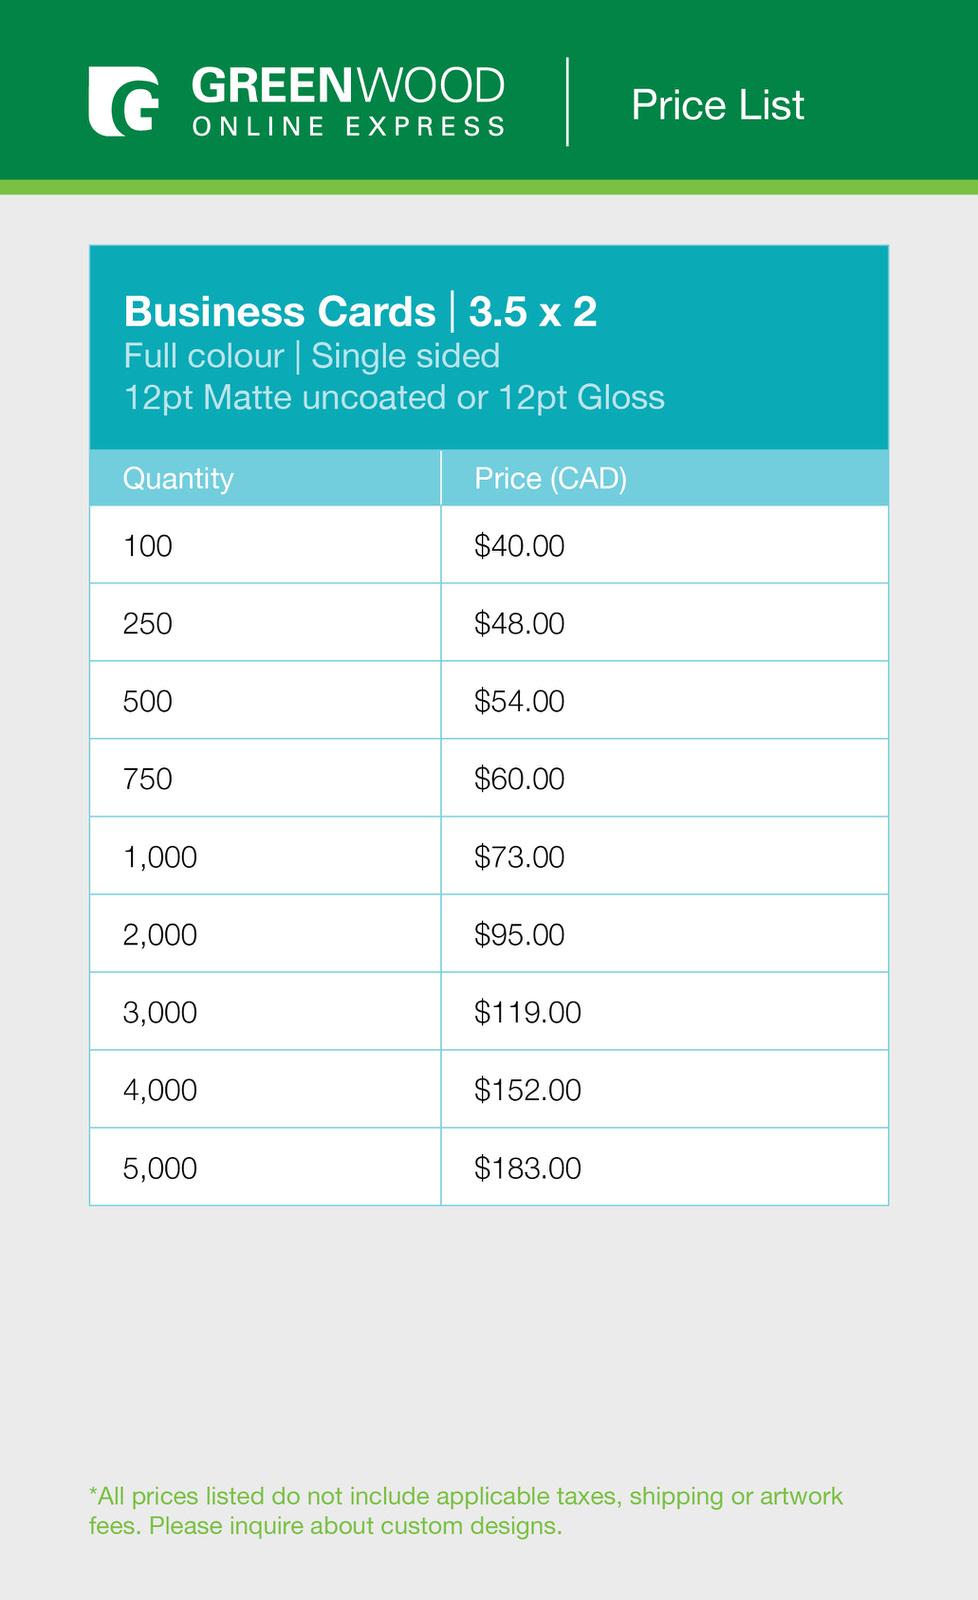 Greenwood bc colour single sided price list.jpg